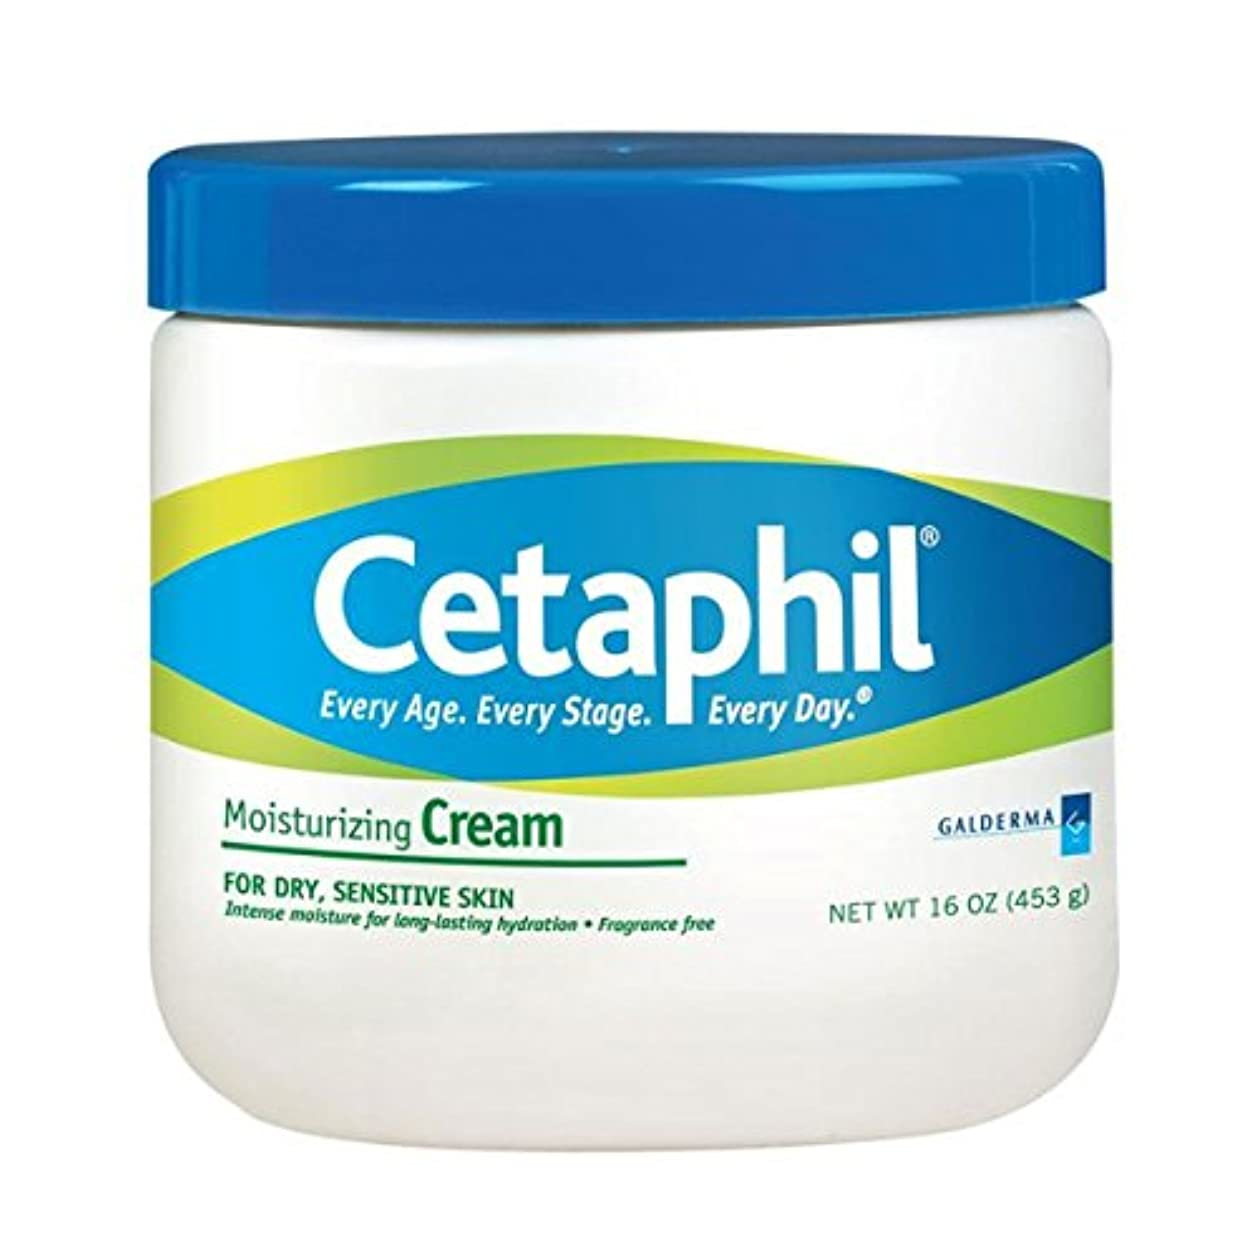 深さ義務力Cetaphil Moisturizing Cream 453g [並行輸入品]